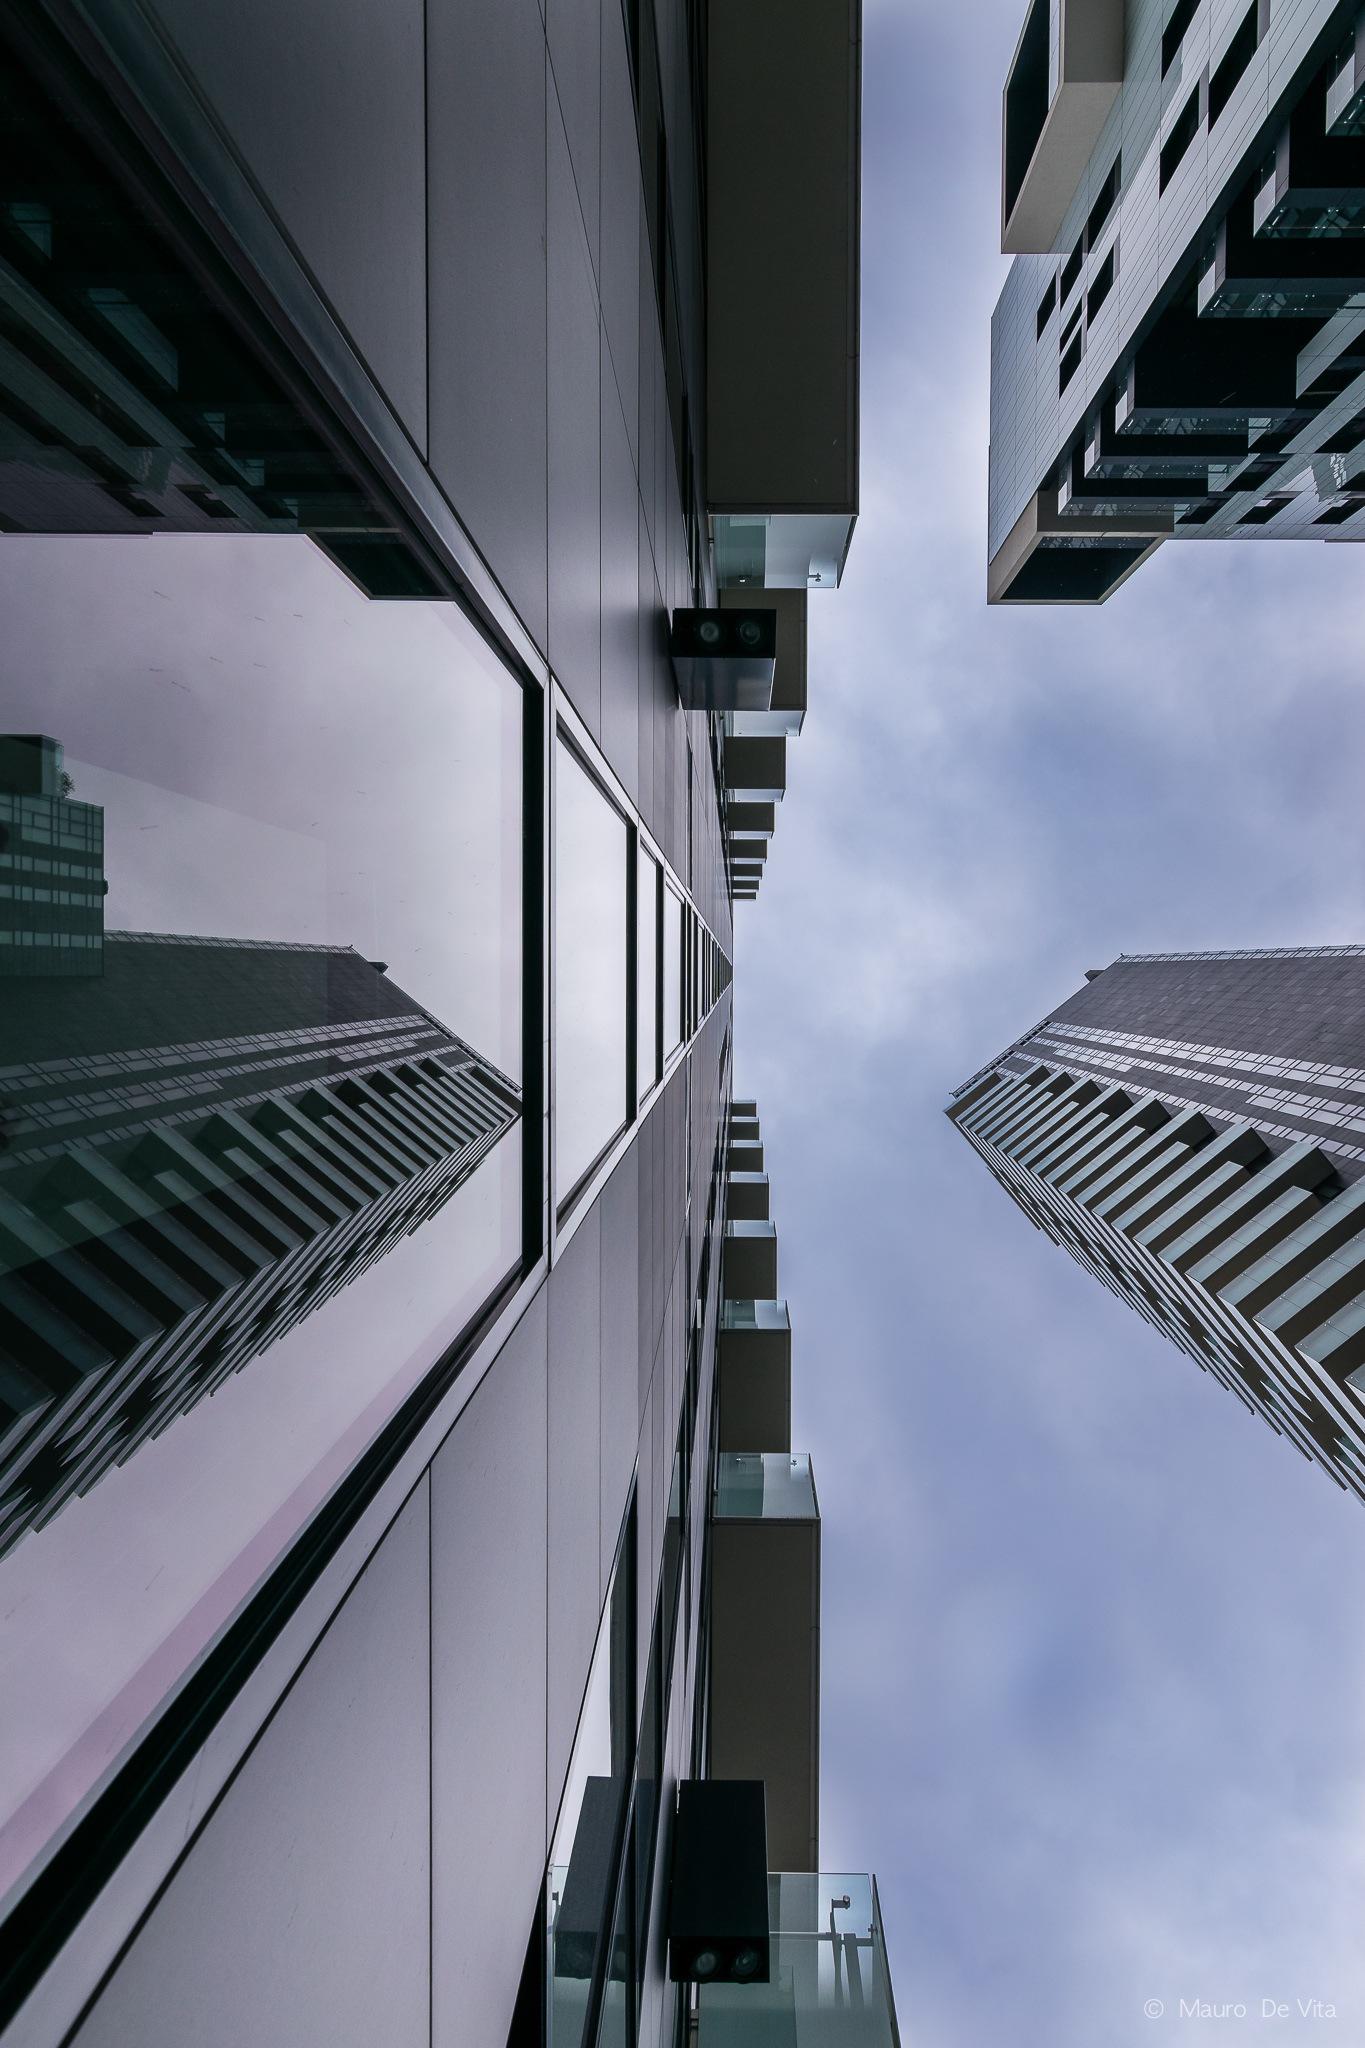 Buildings by Mauro De Vita